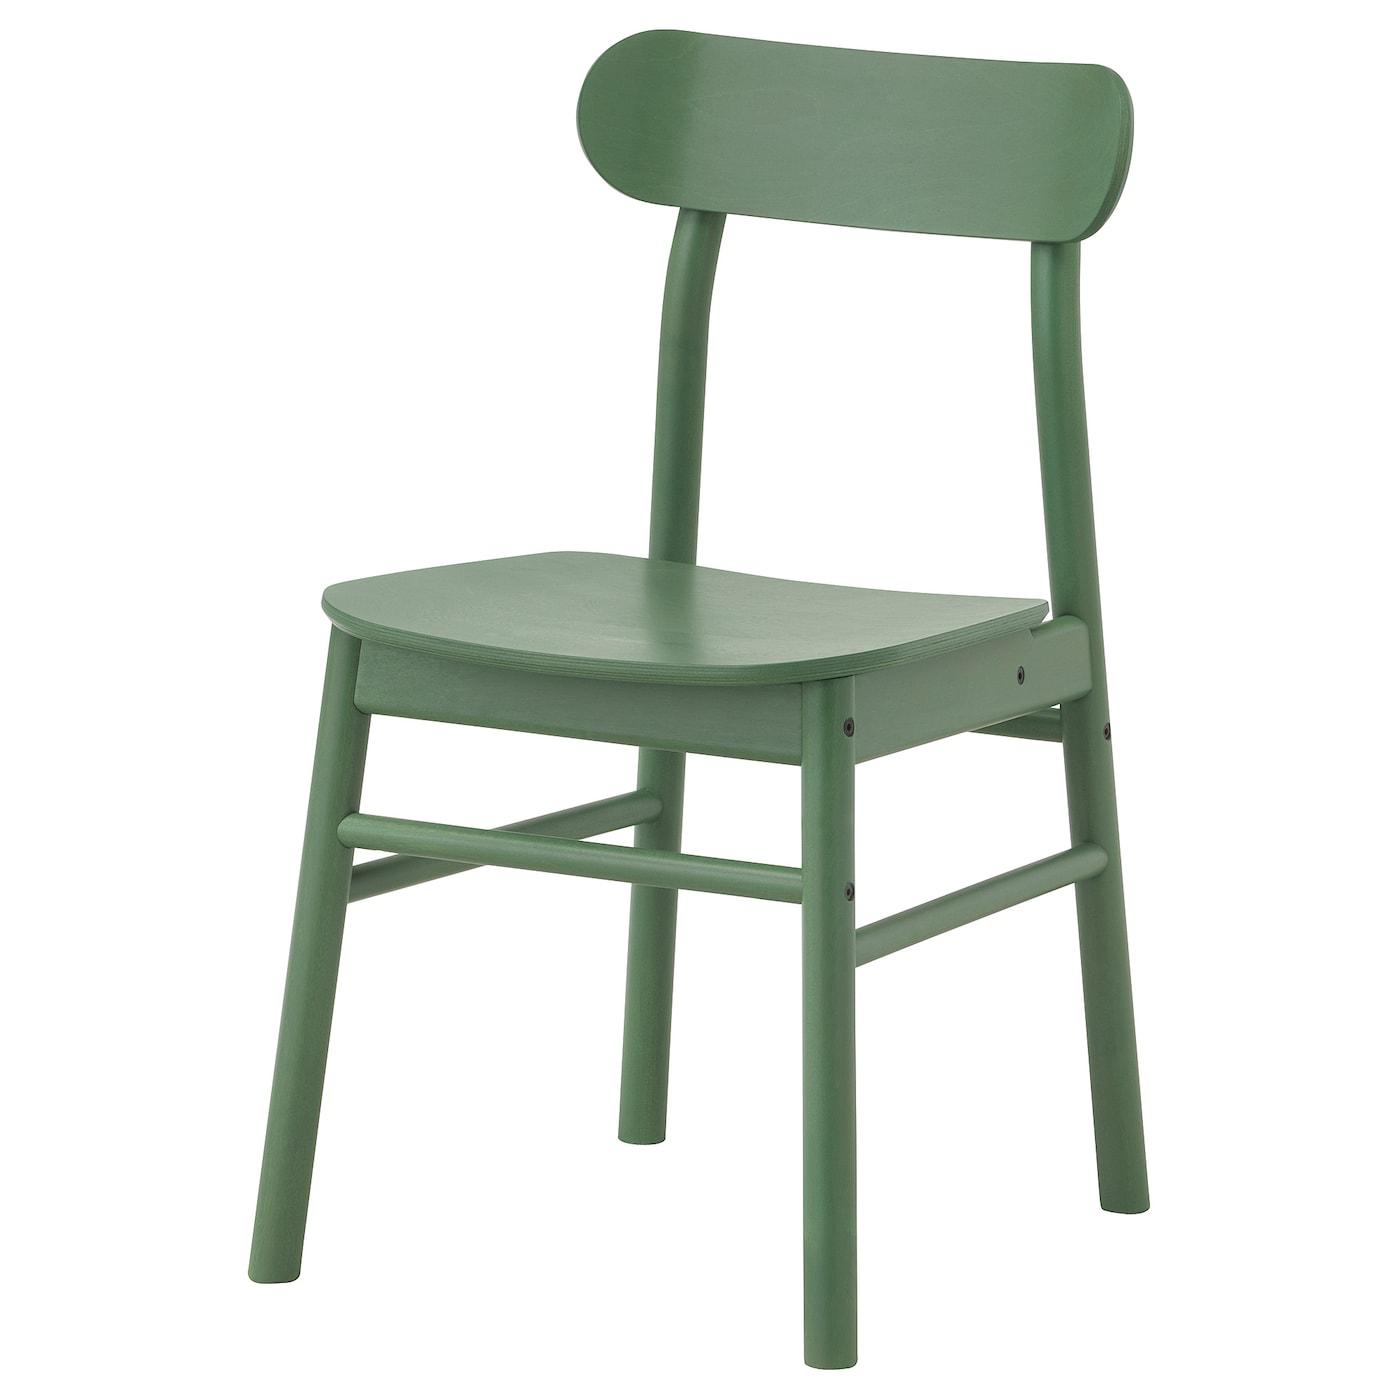 Ikea Ronninge Stuhl Grun Moebel Suchmaschine Ladendirekt De